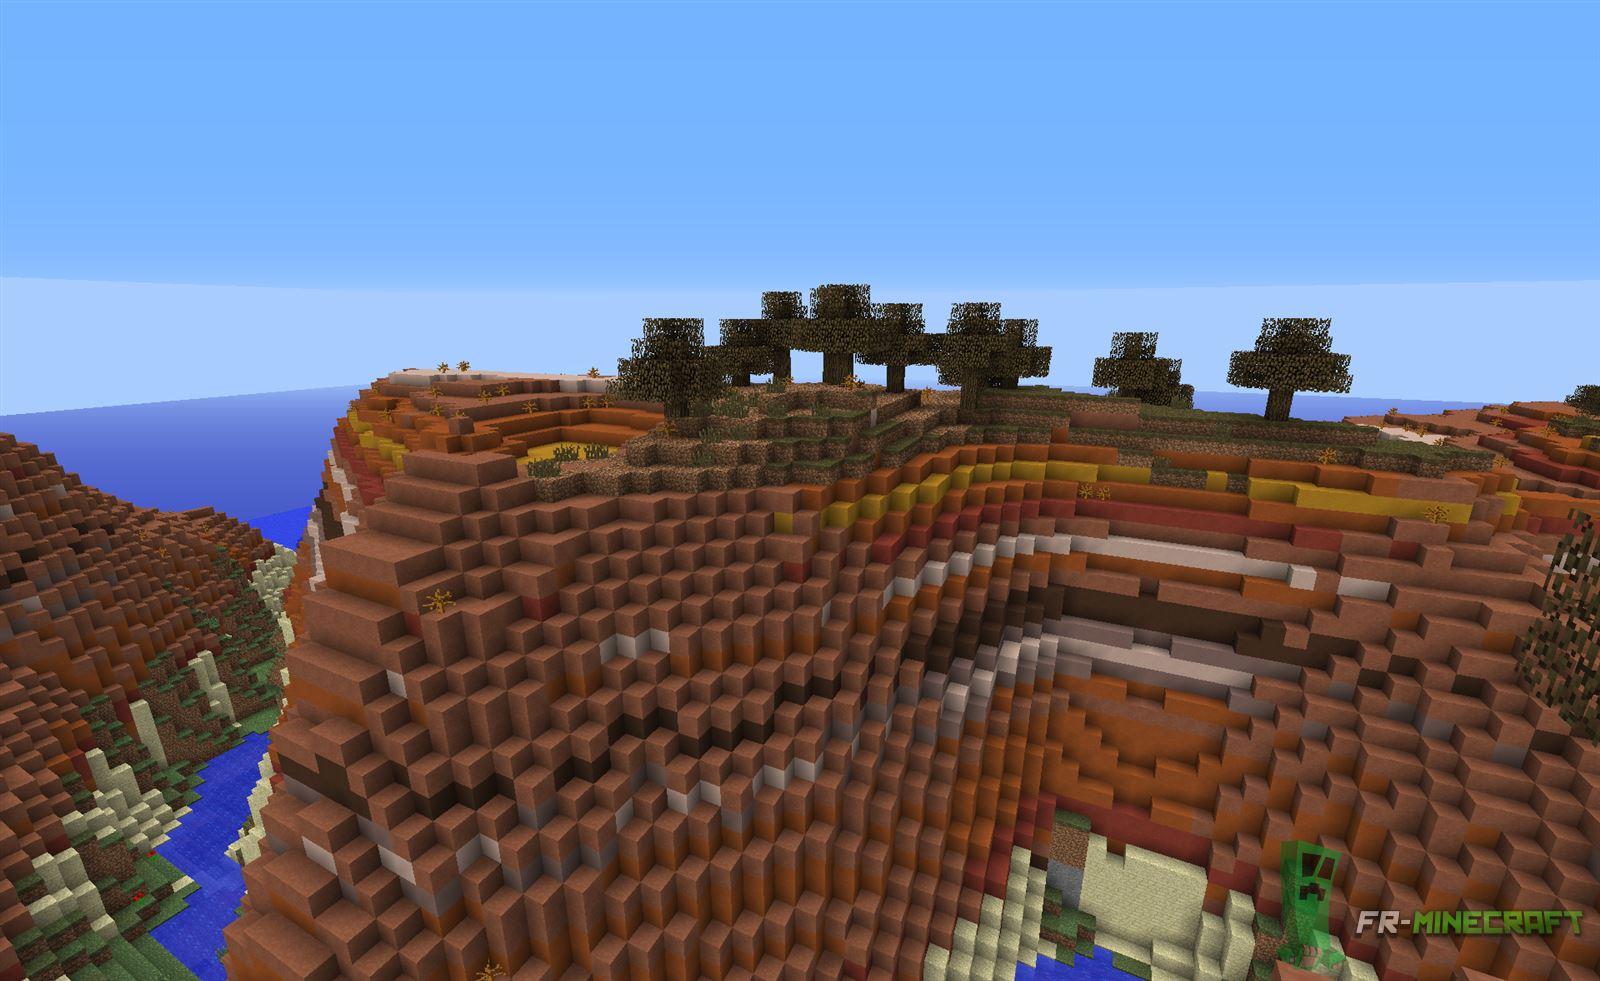 minecraft biome plateau forestier du canyon. Black Bedroom Furniture Sets. Home Design Ideas